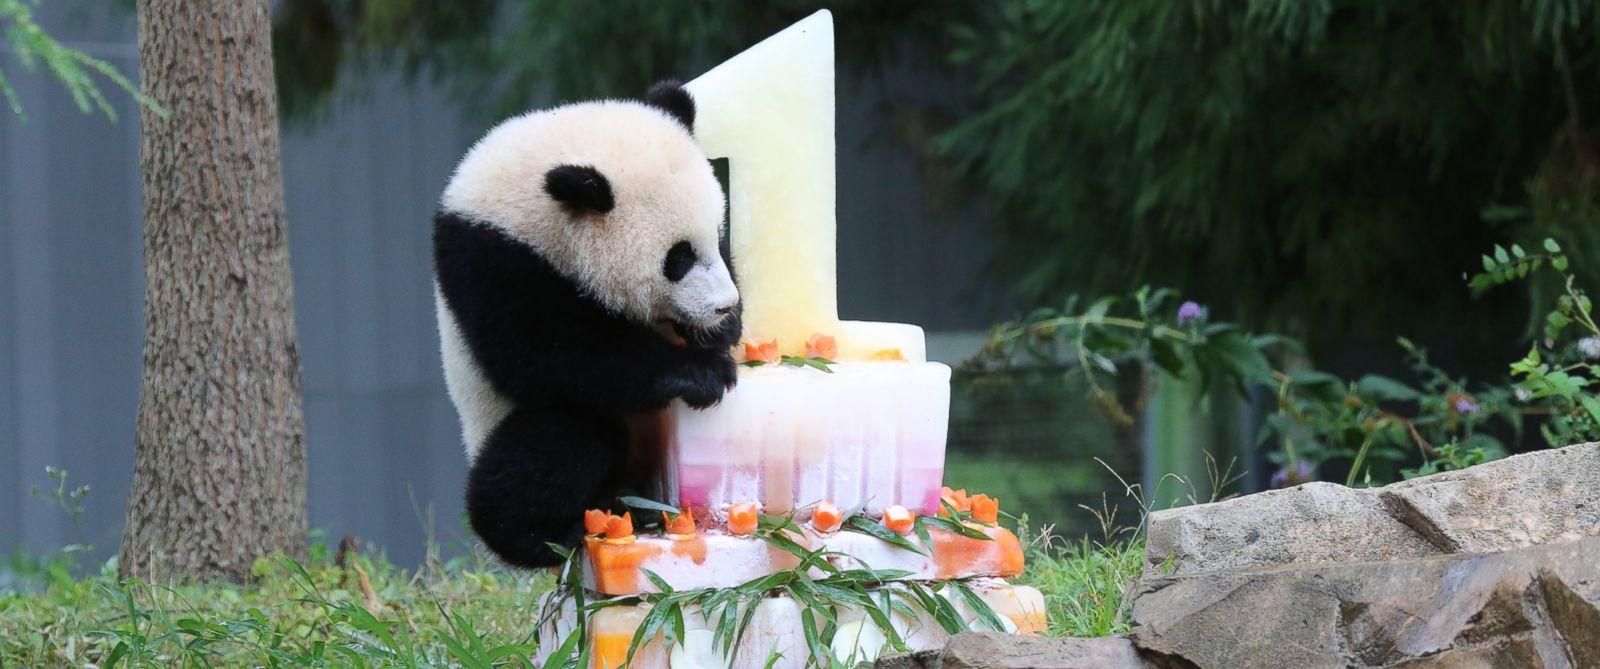 PHOTO: Giant panda Bao Bao celebrates her first birthday at the Smithsonians National Zoo, Aug. 23, 2014.